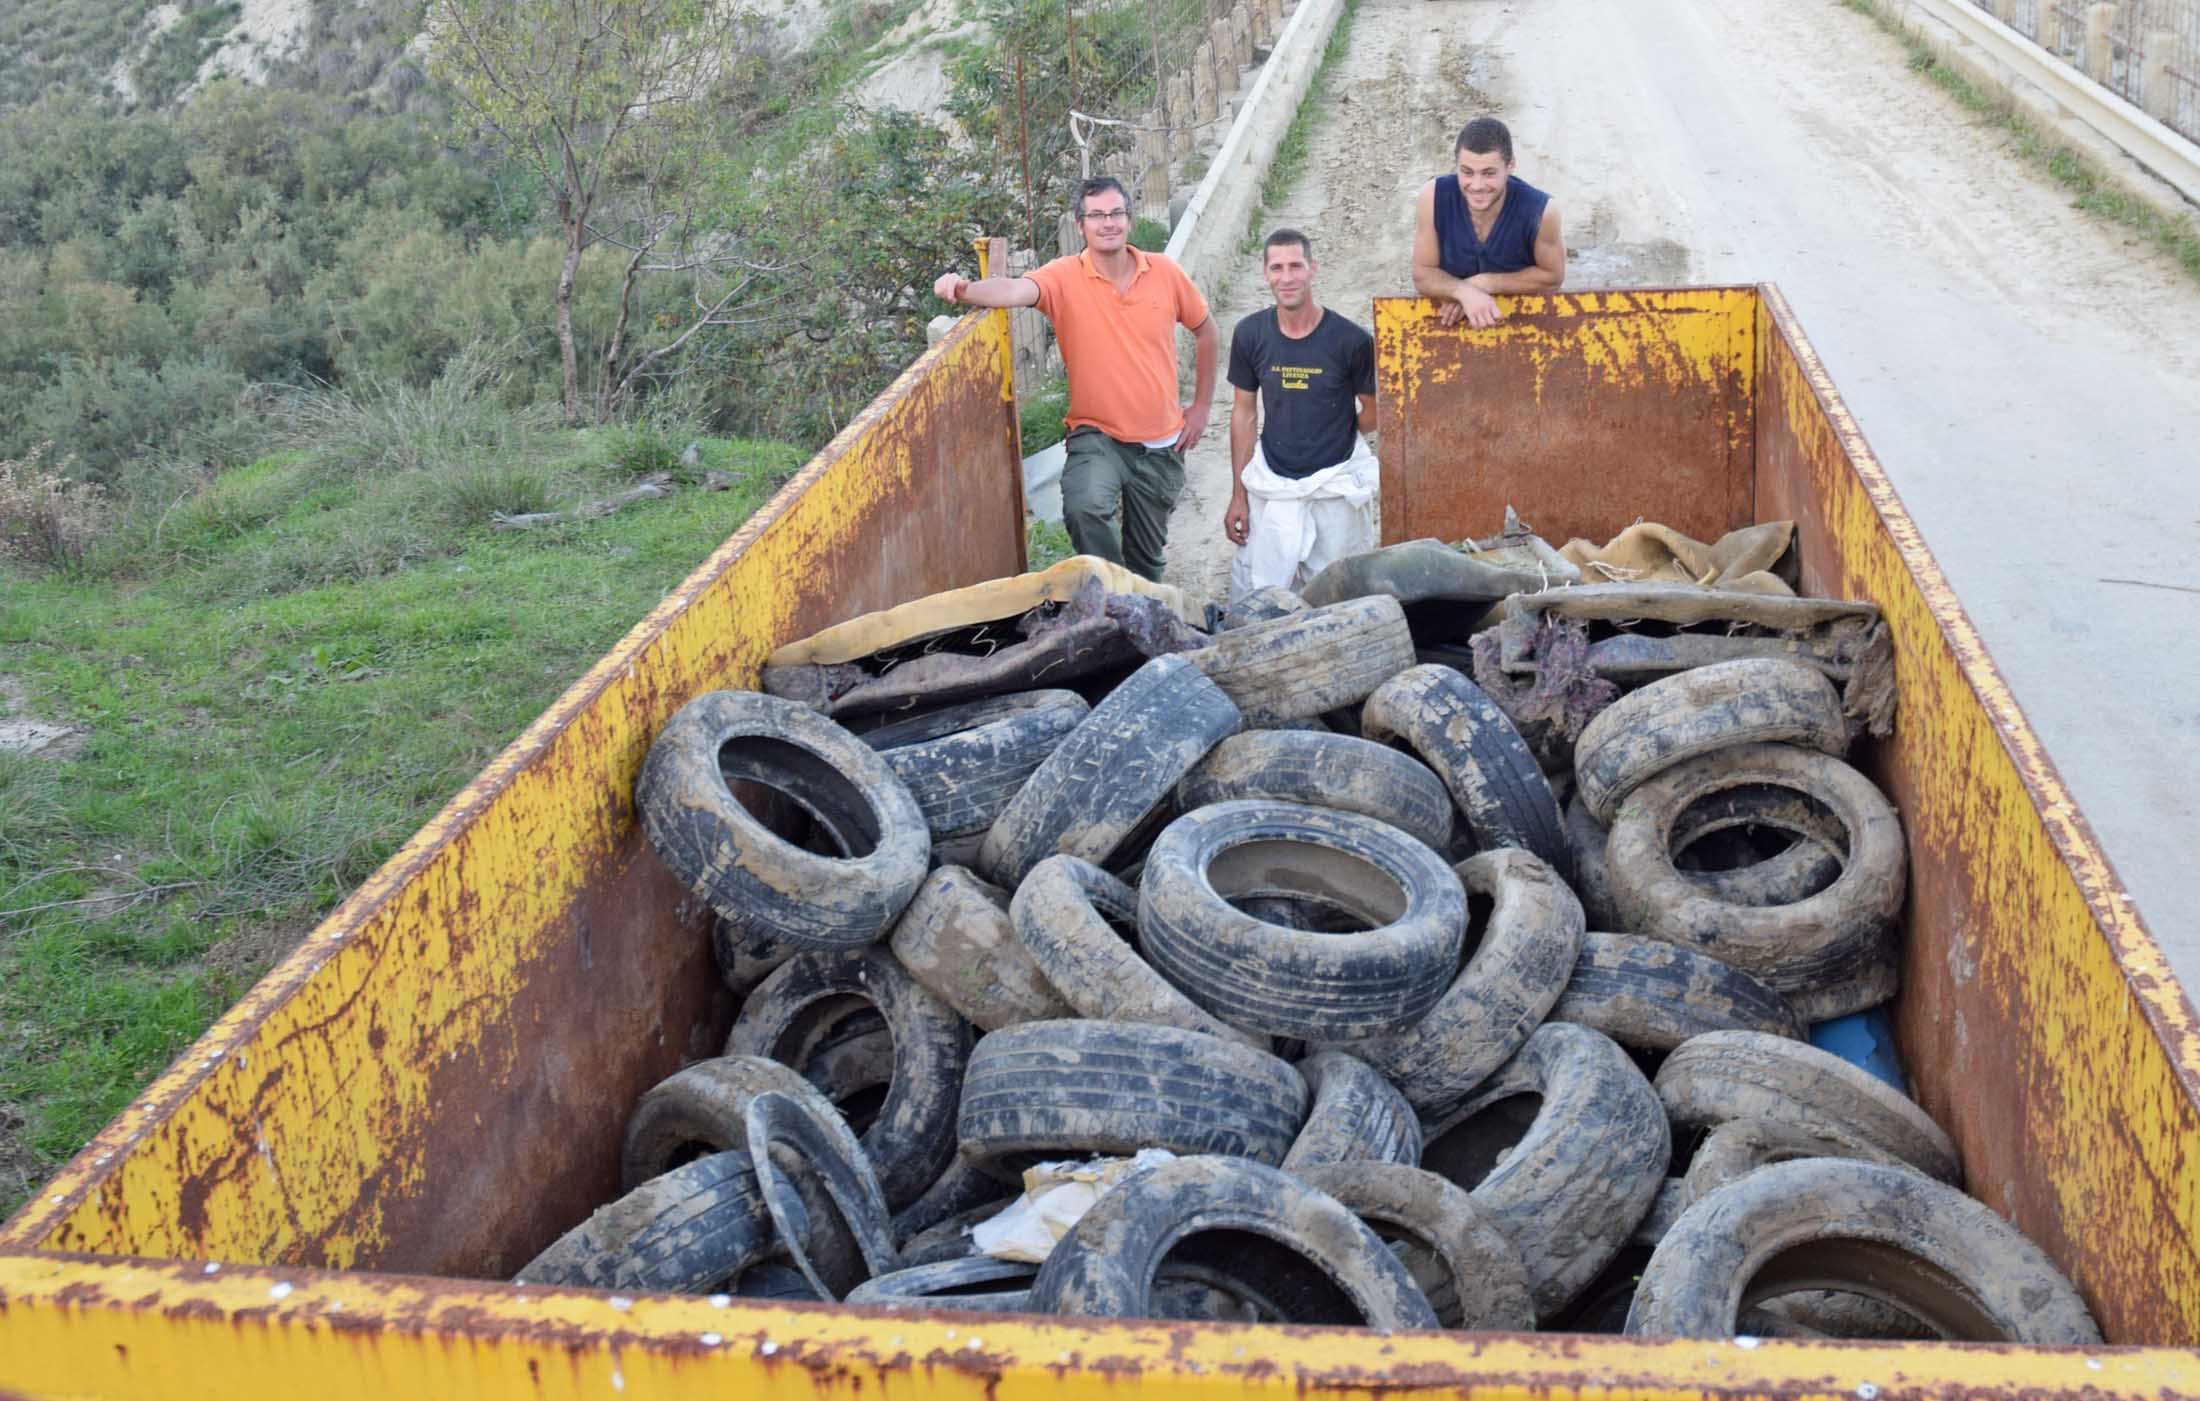 Bonificato l'alveo del torrente Brace: rimossi 150 pneumatici